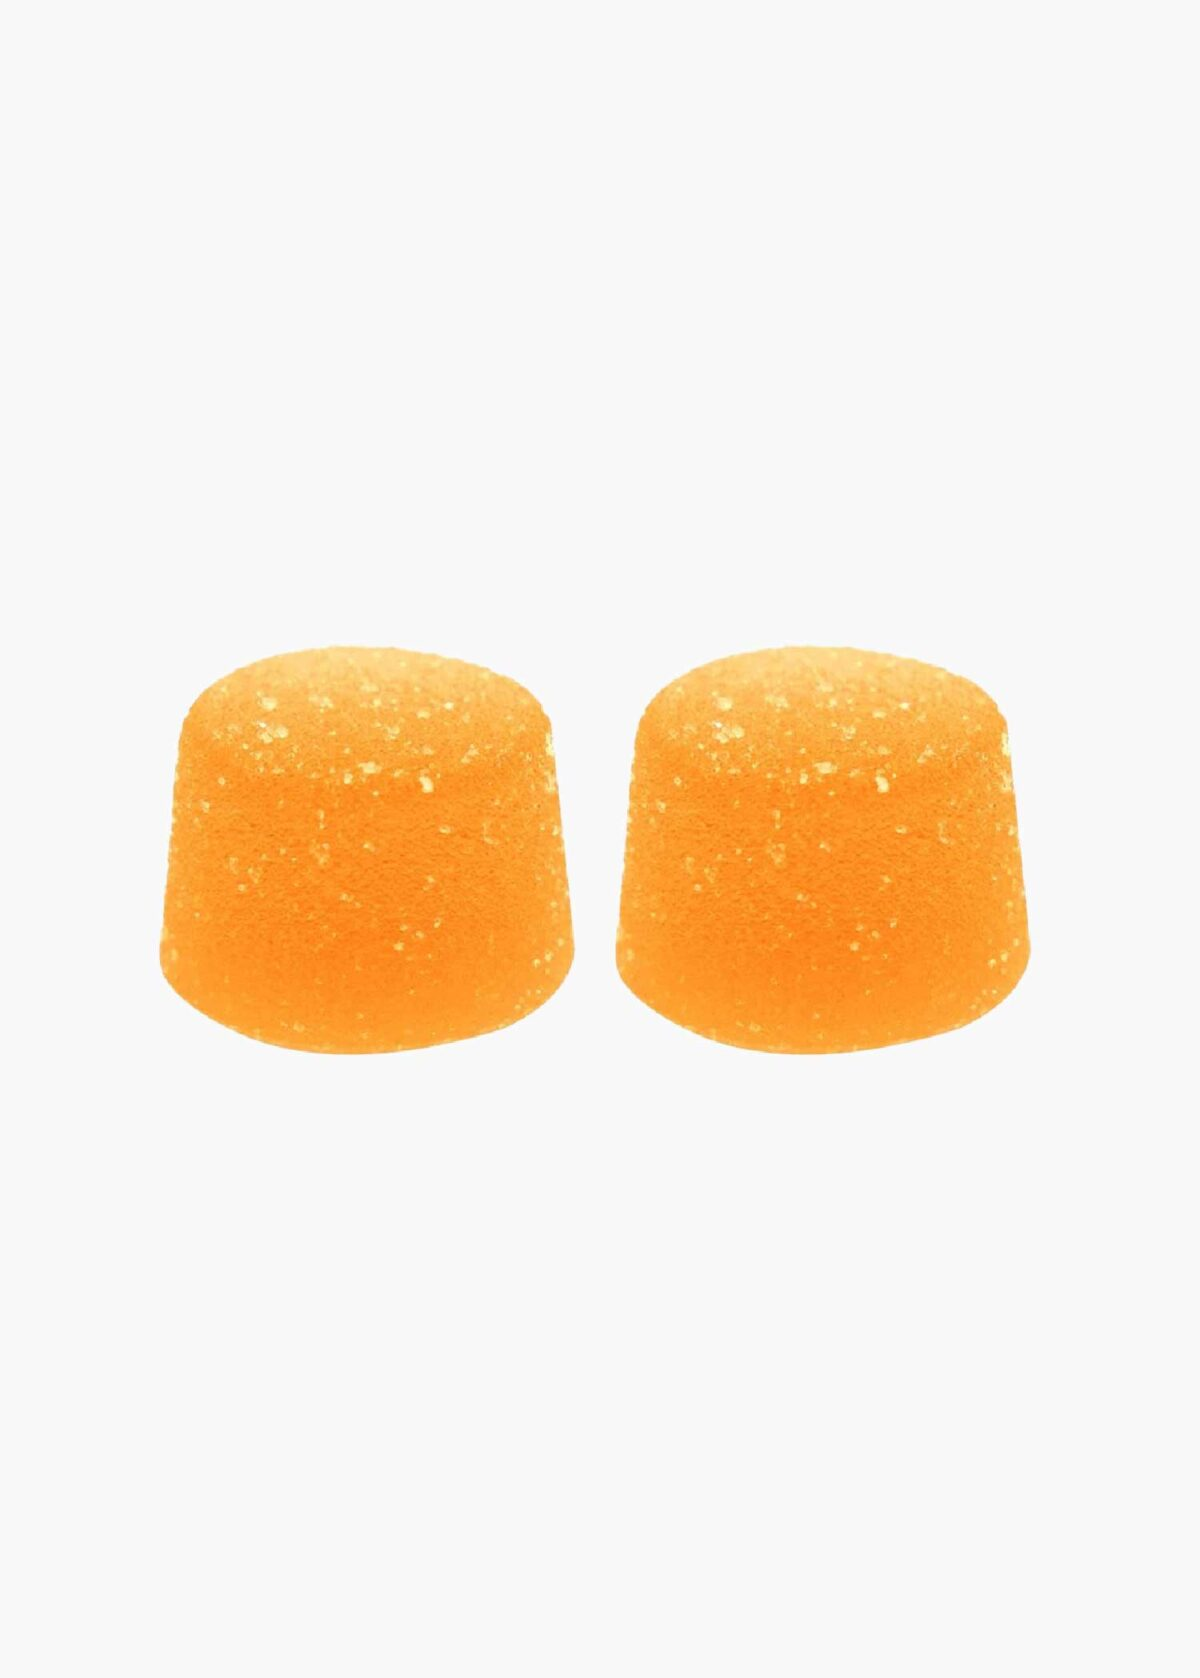 Foray Peach Mango Chews